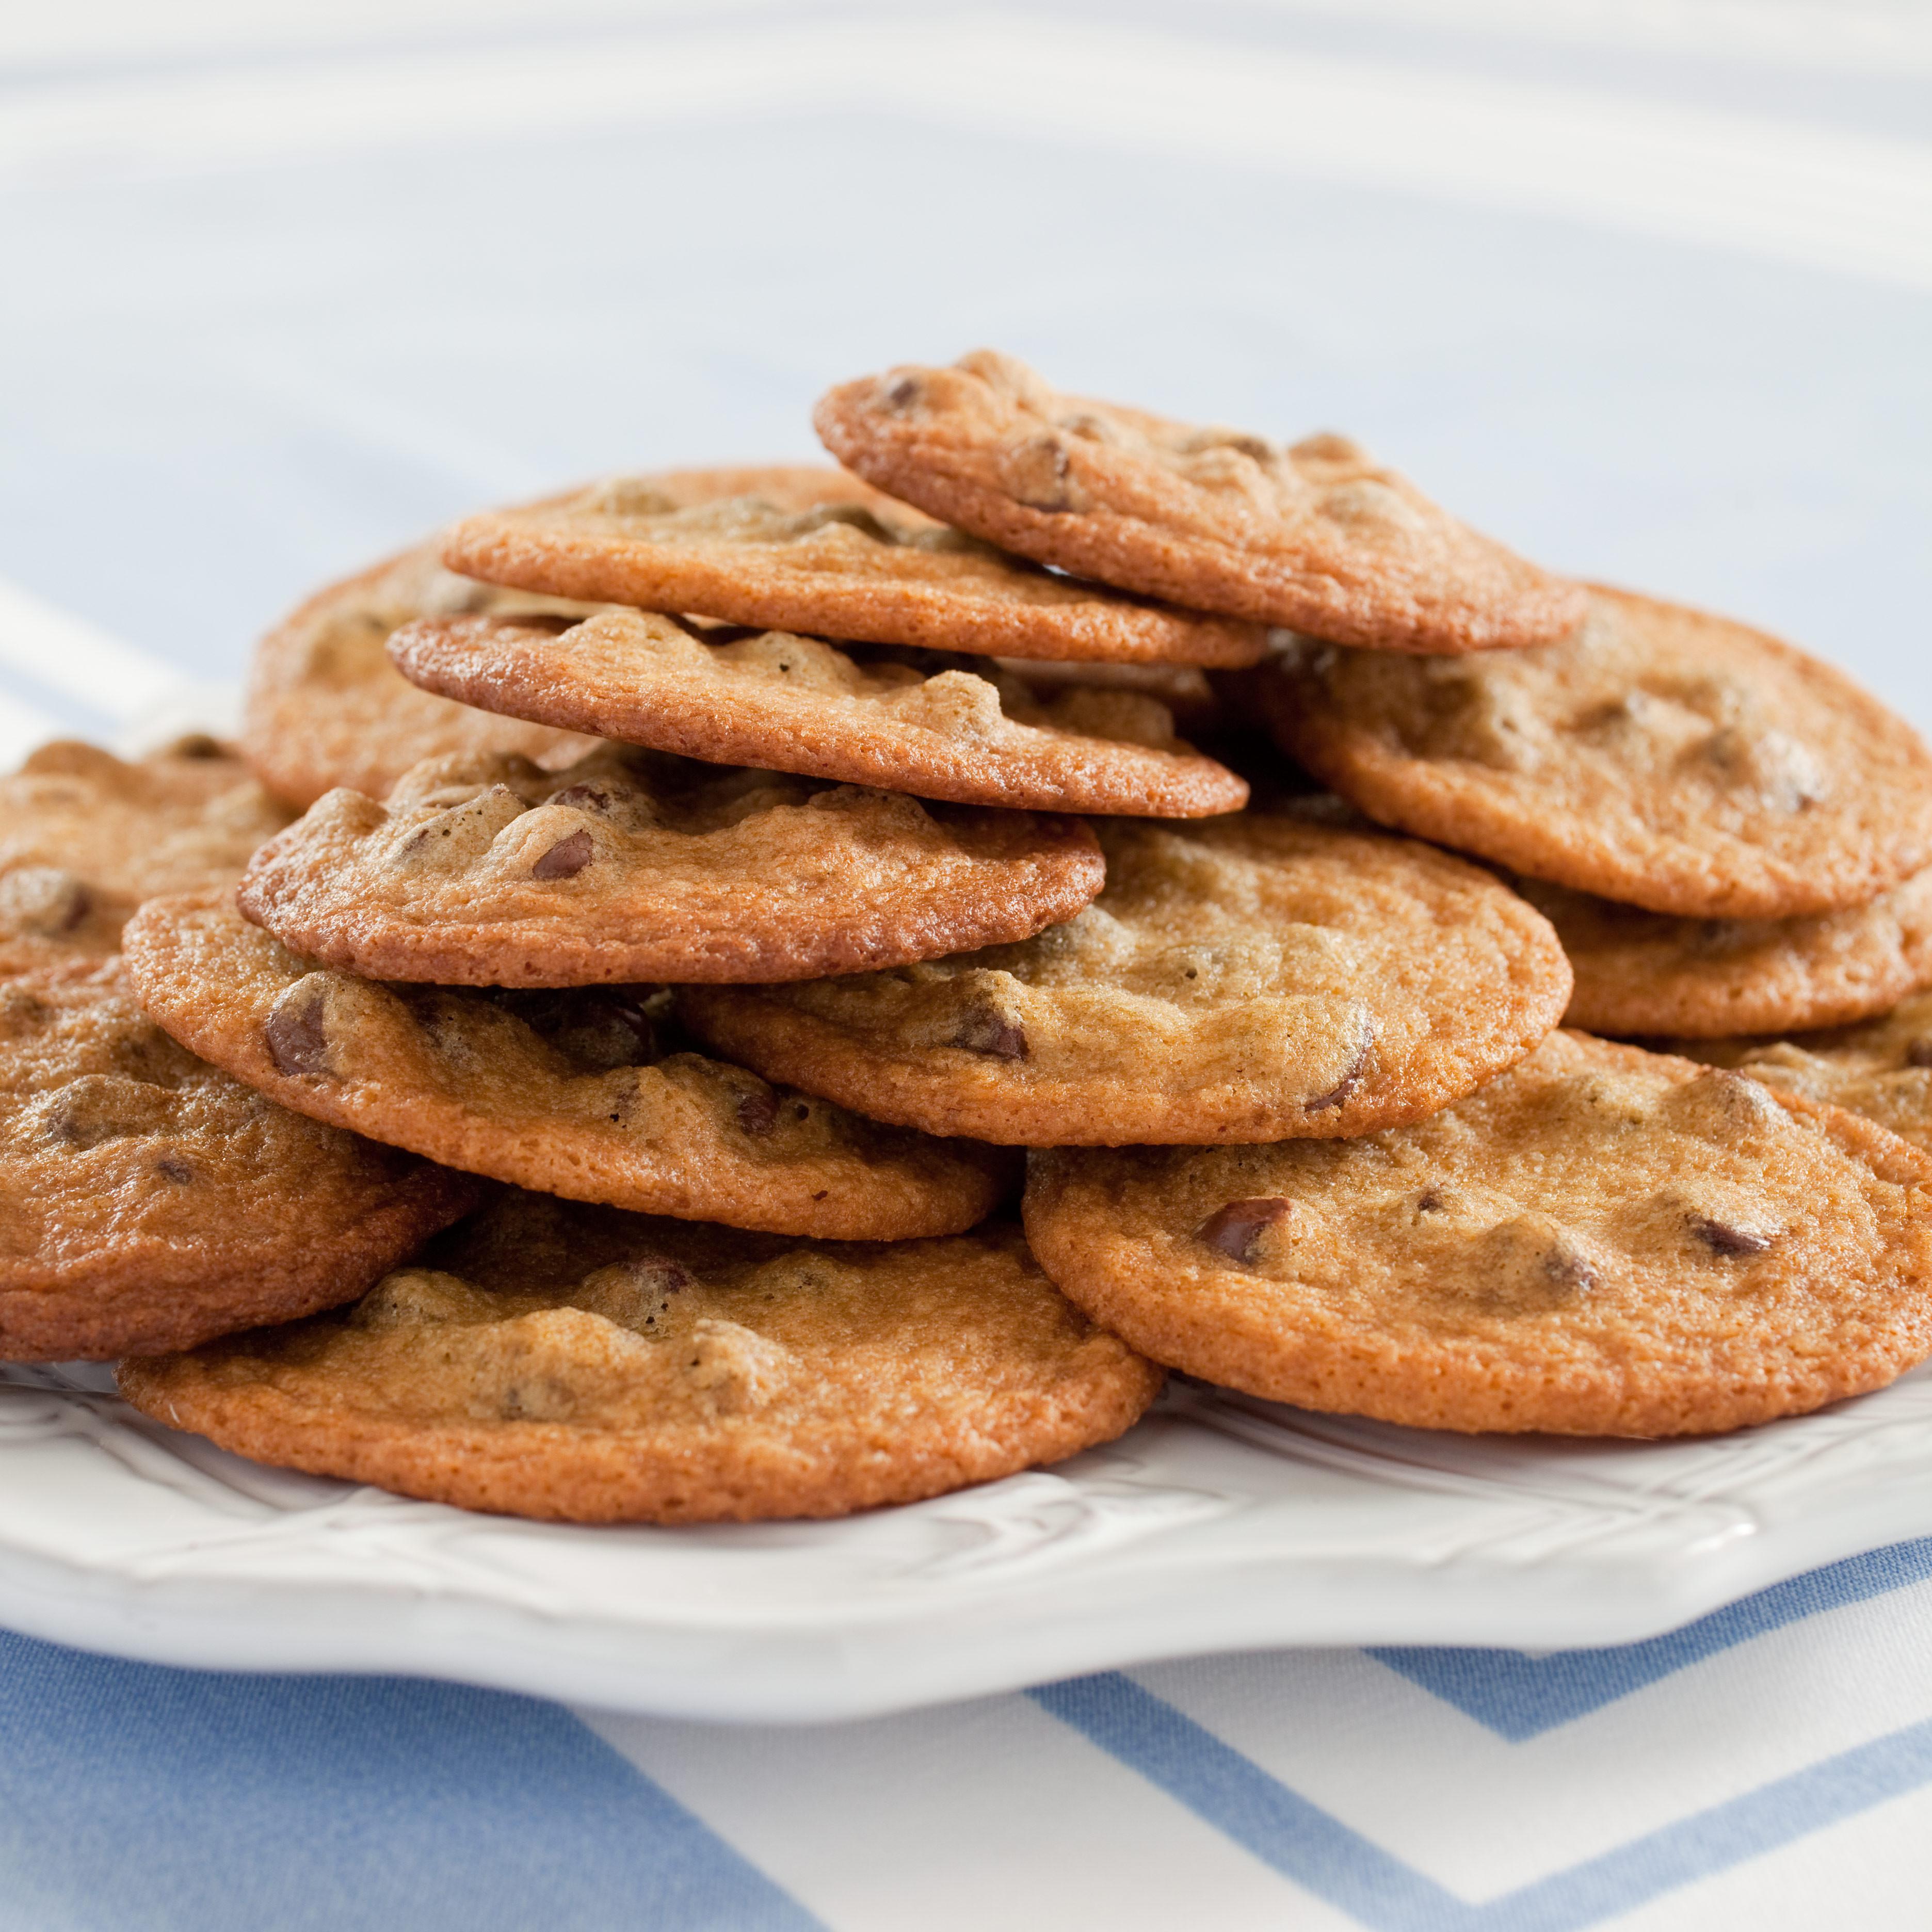 Thin Crispy Chocolate Chip Cookies  Thin Crispy Chocolate Chip Cookies Recipe Cook s